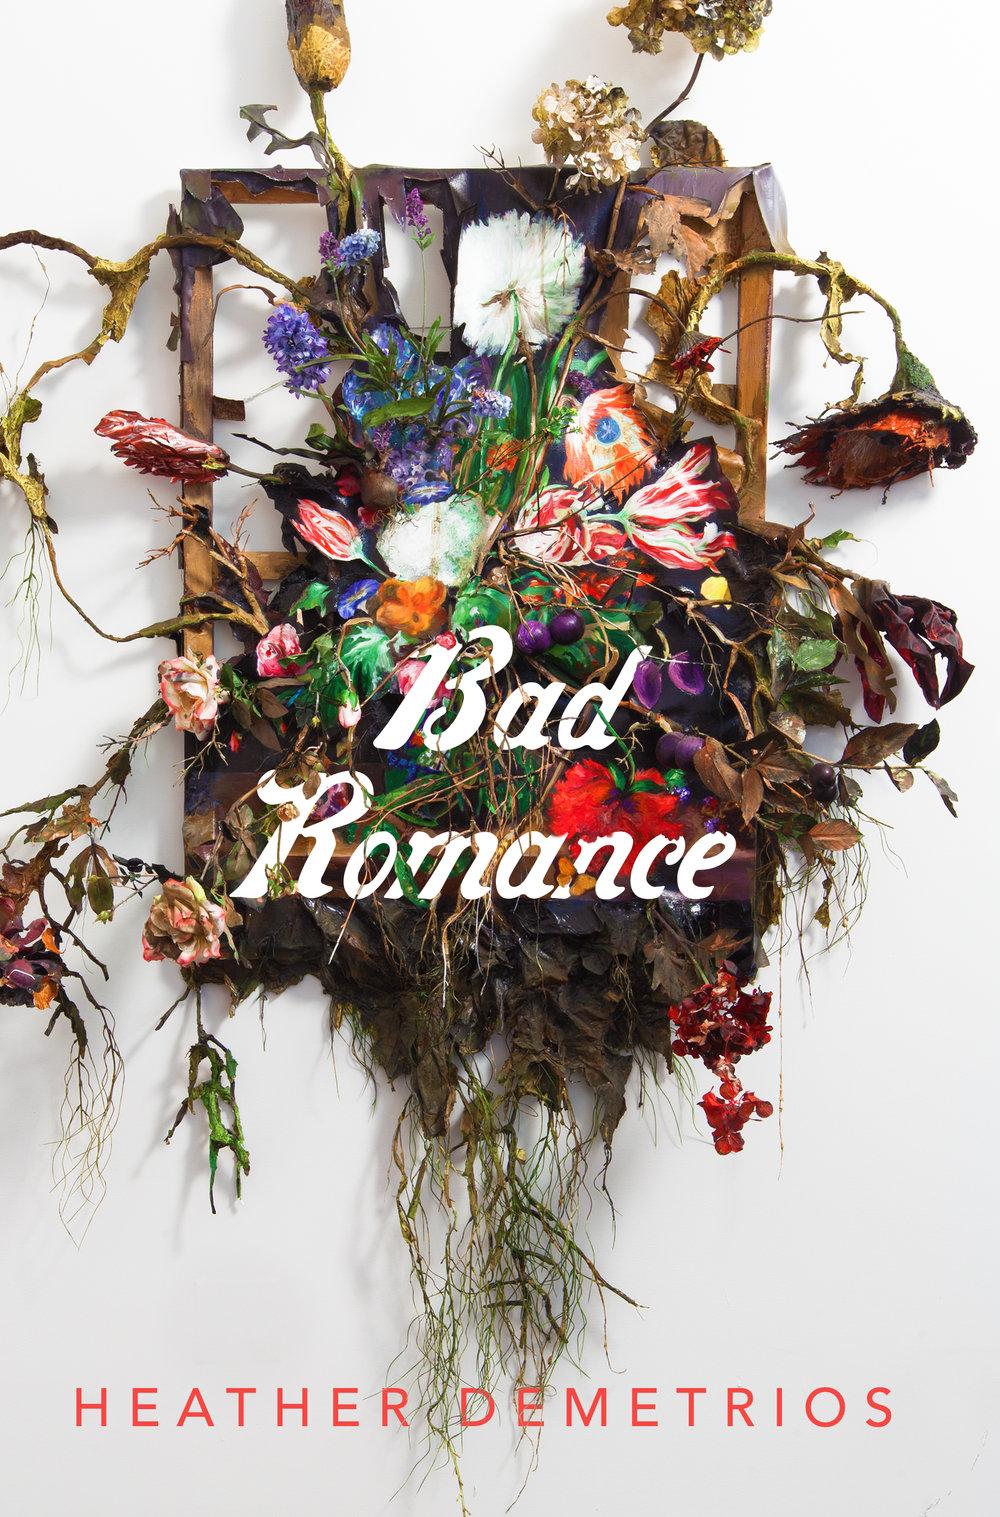 BadRomance_CVR.jpg